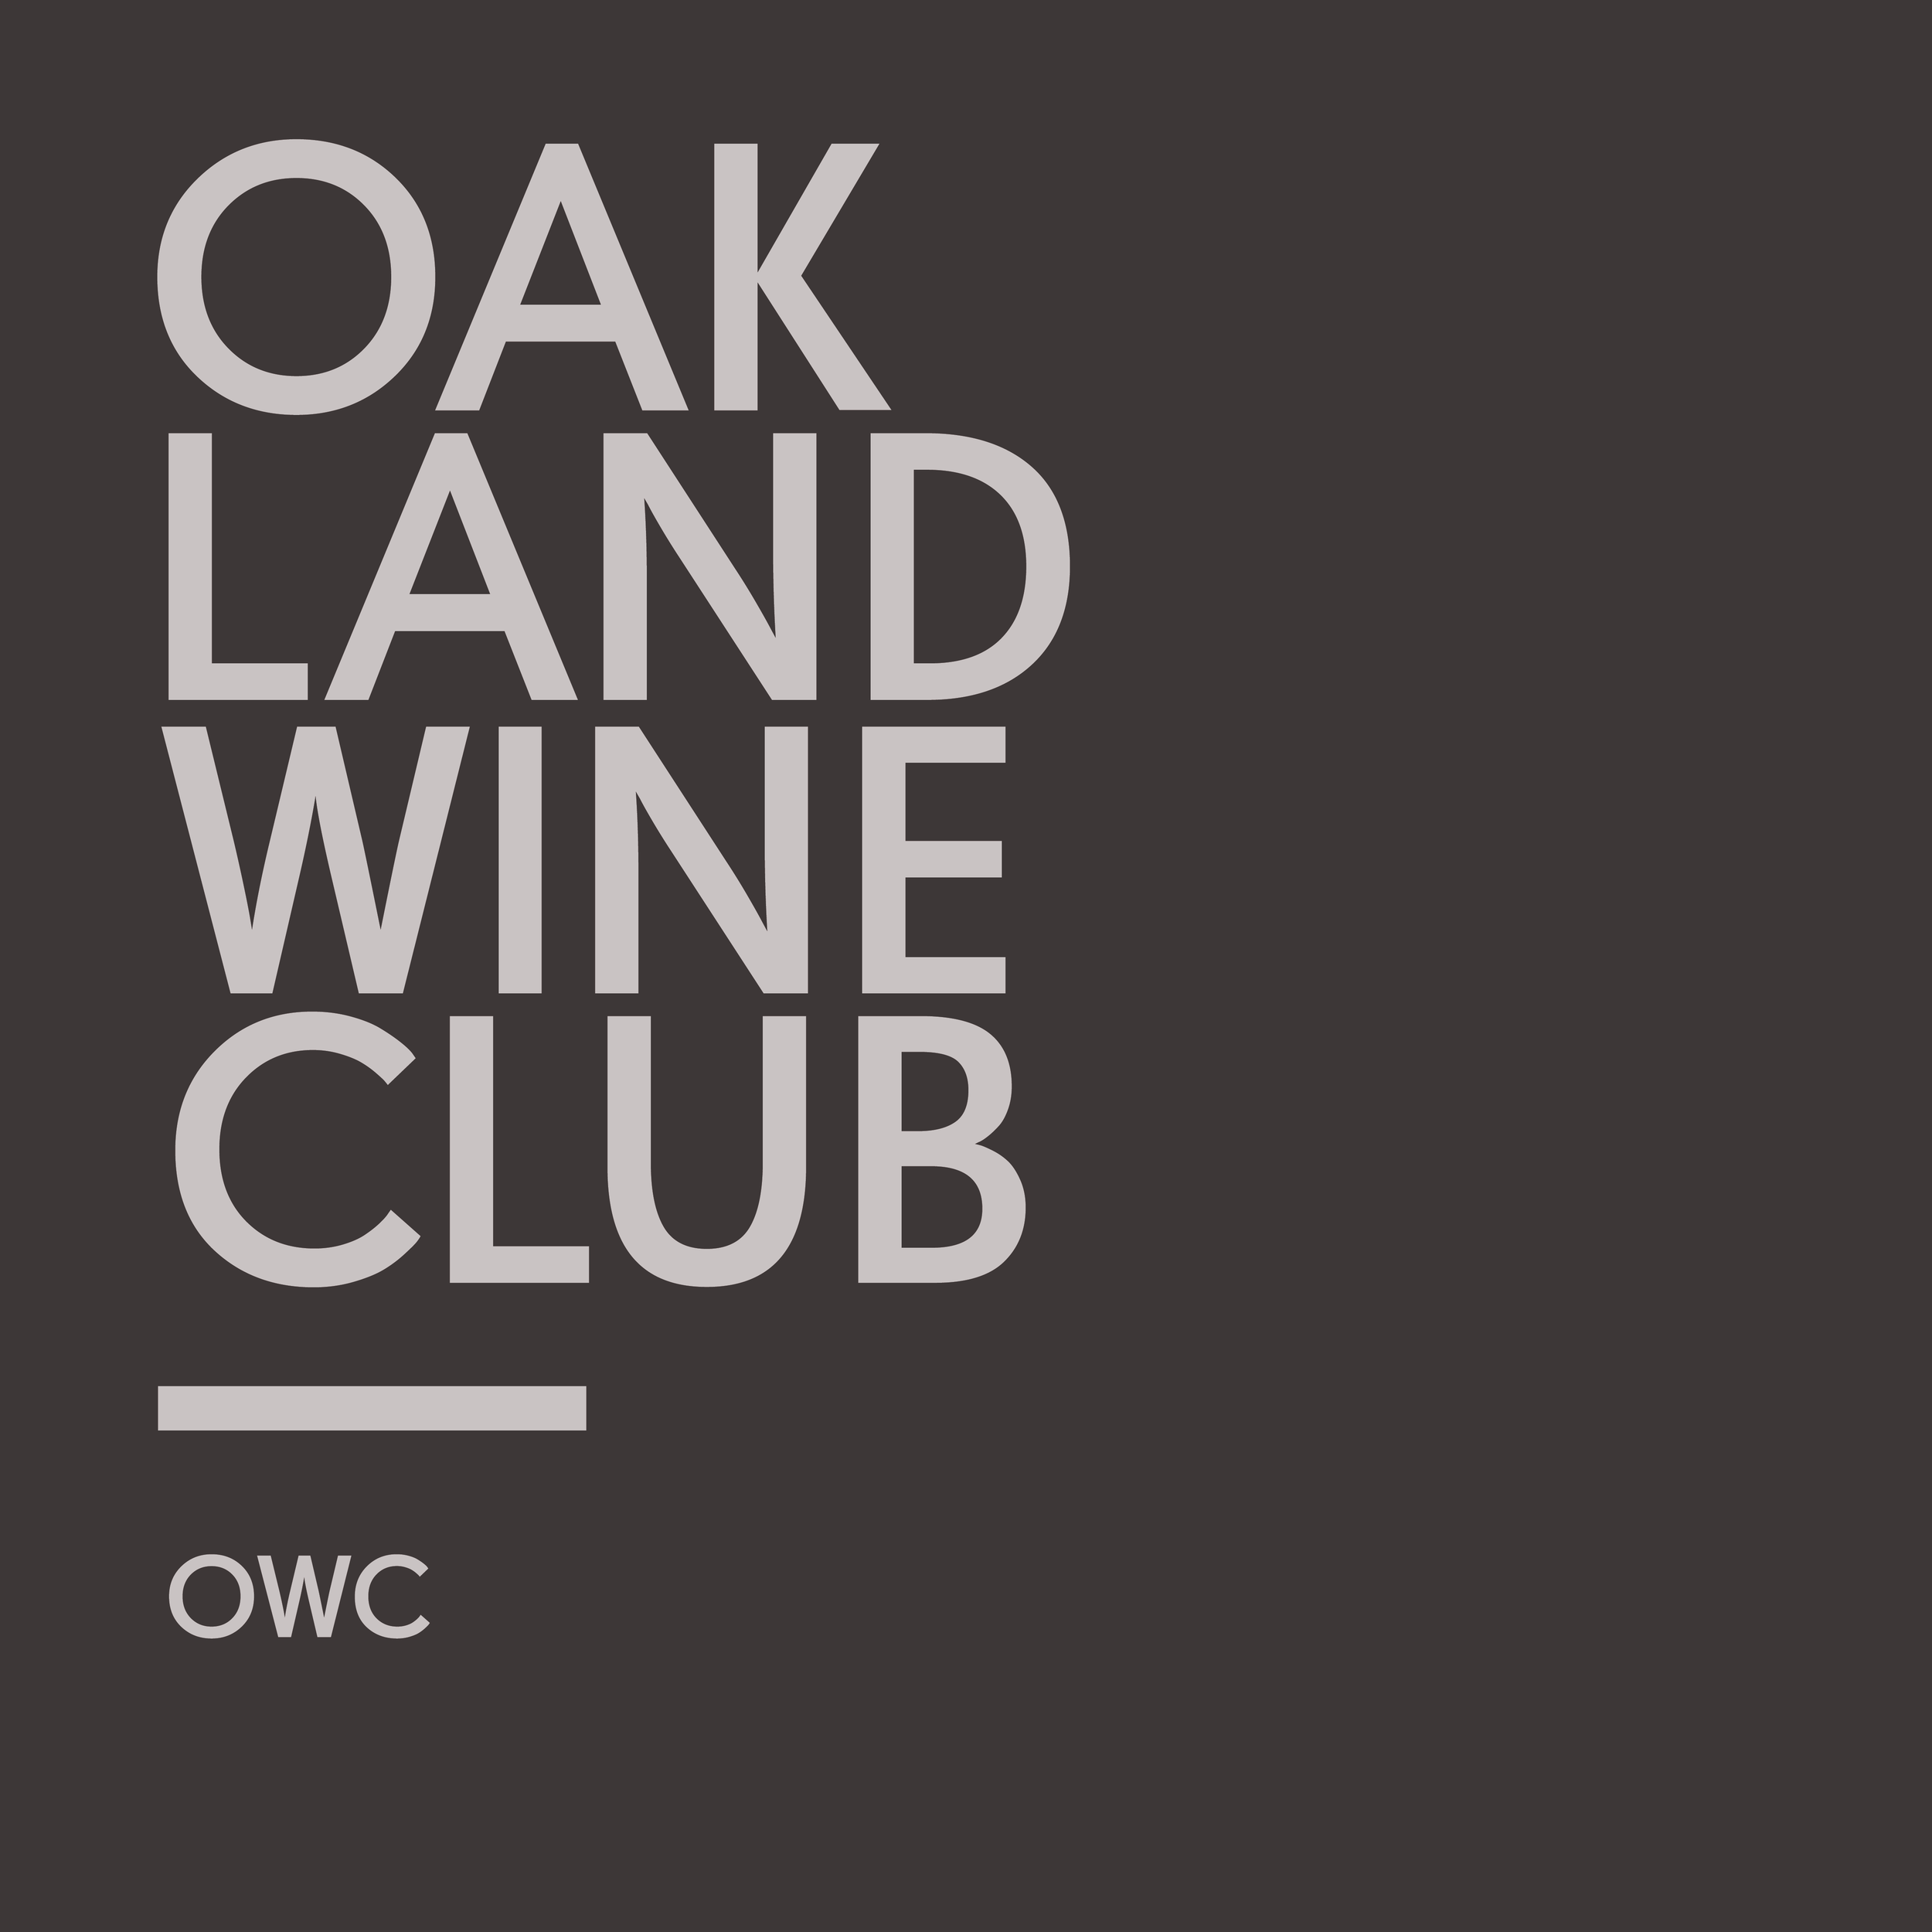 OWC_Clr-logo-2018-02.png